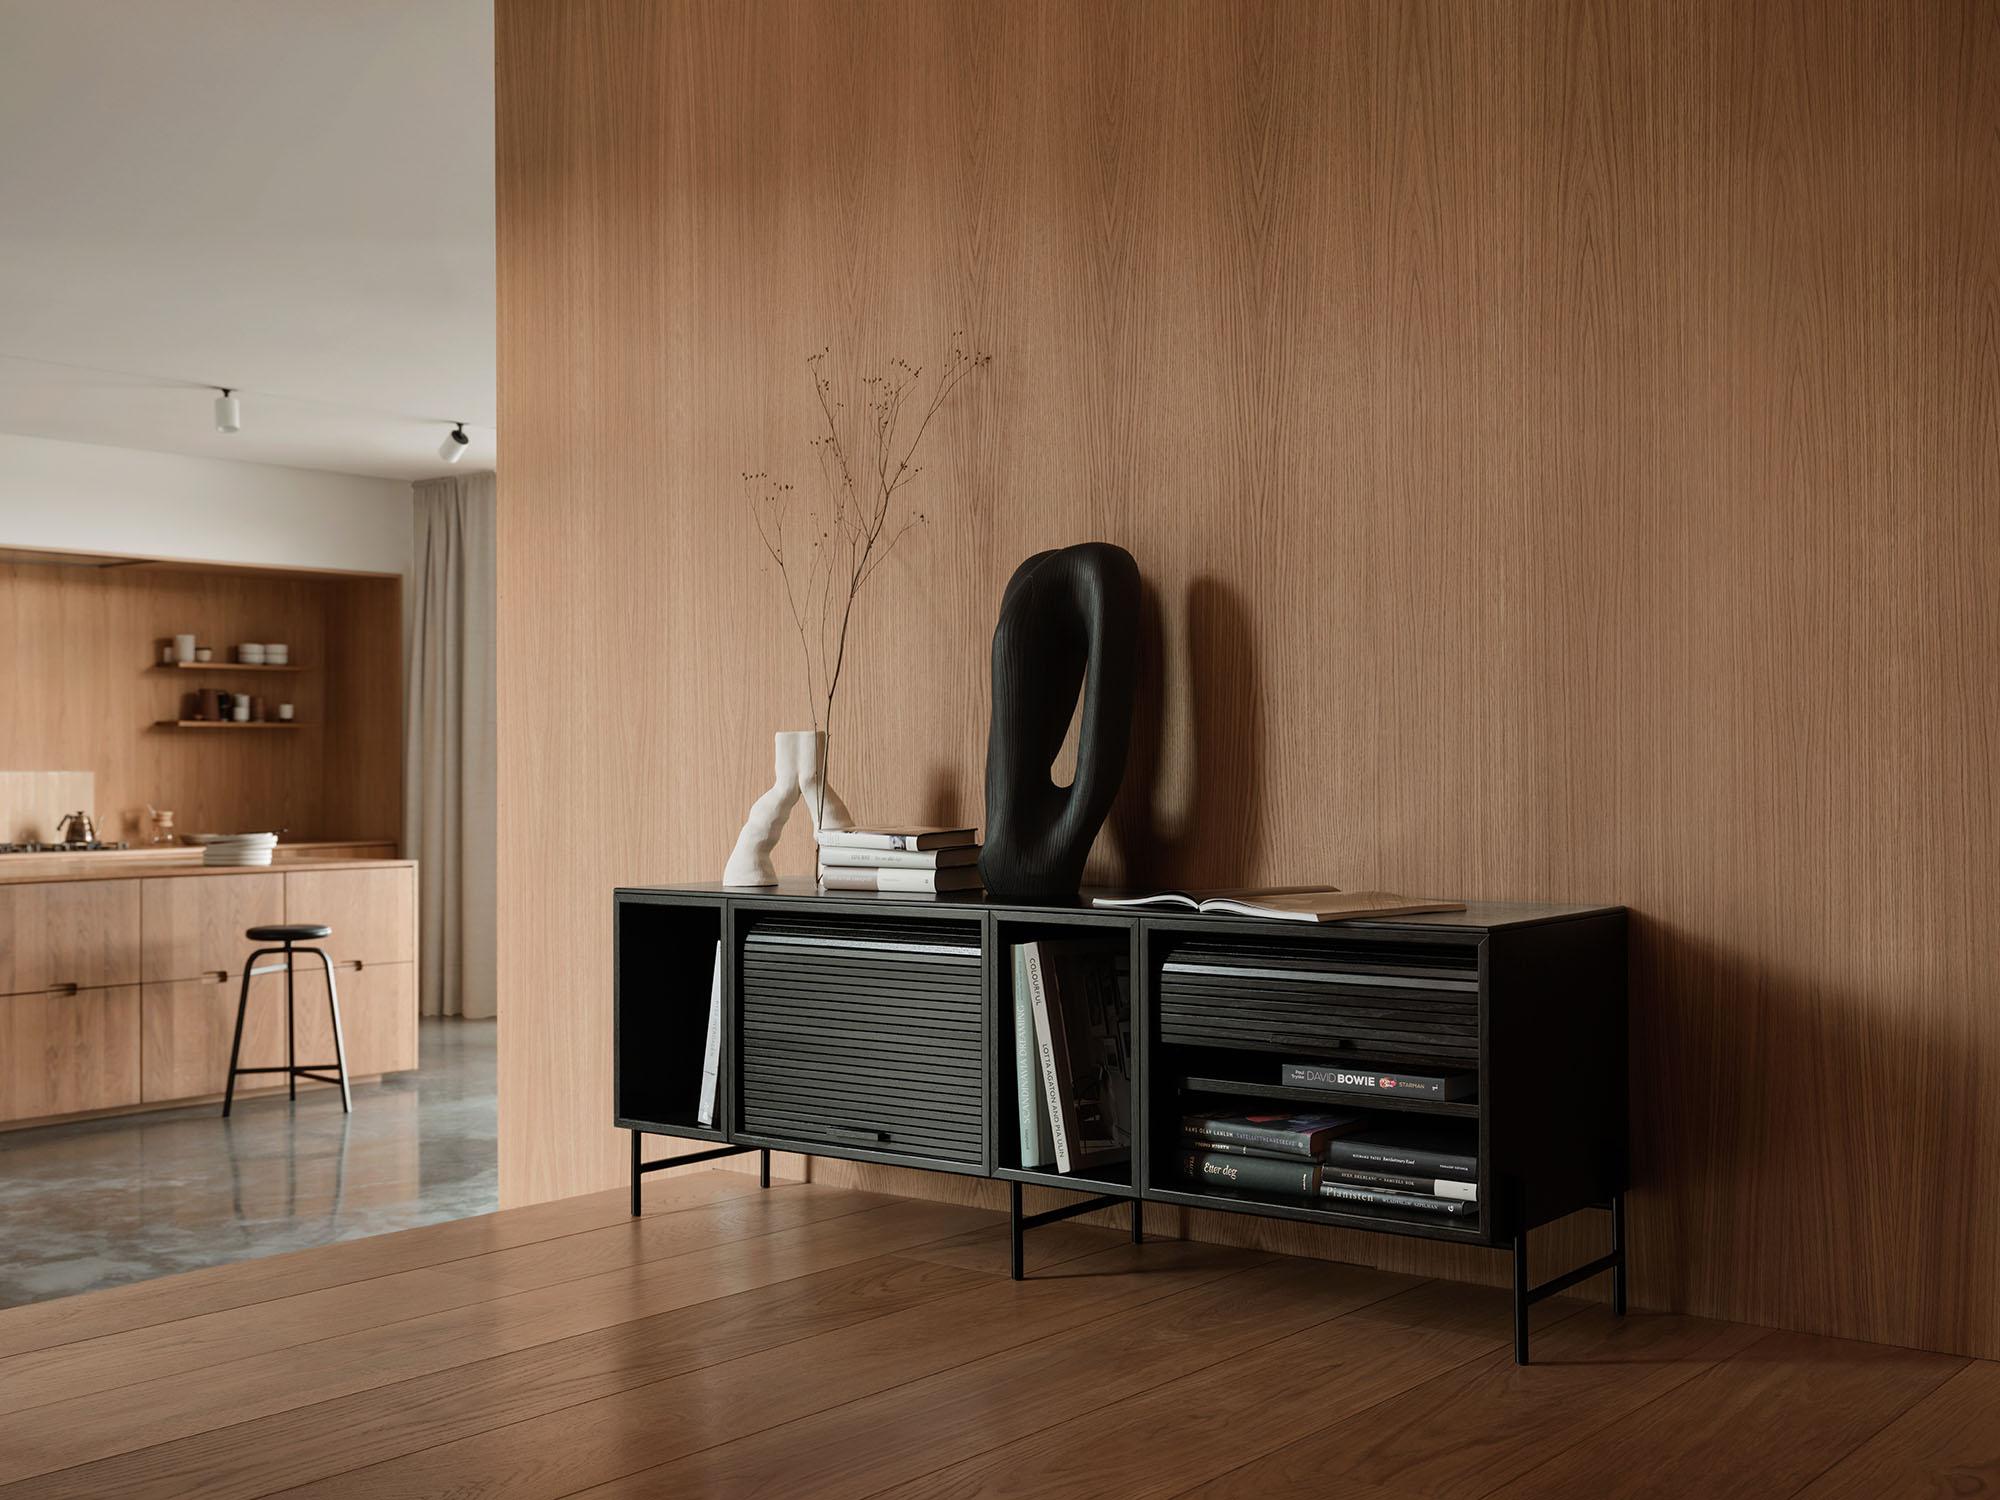 Hifive_cabinet_150_black_livingroom_Northern_Photo_Einar_Aslaksen_Low-res